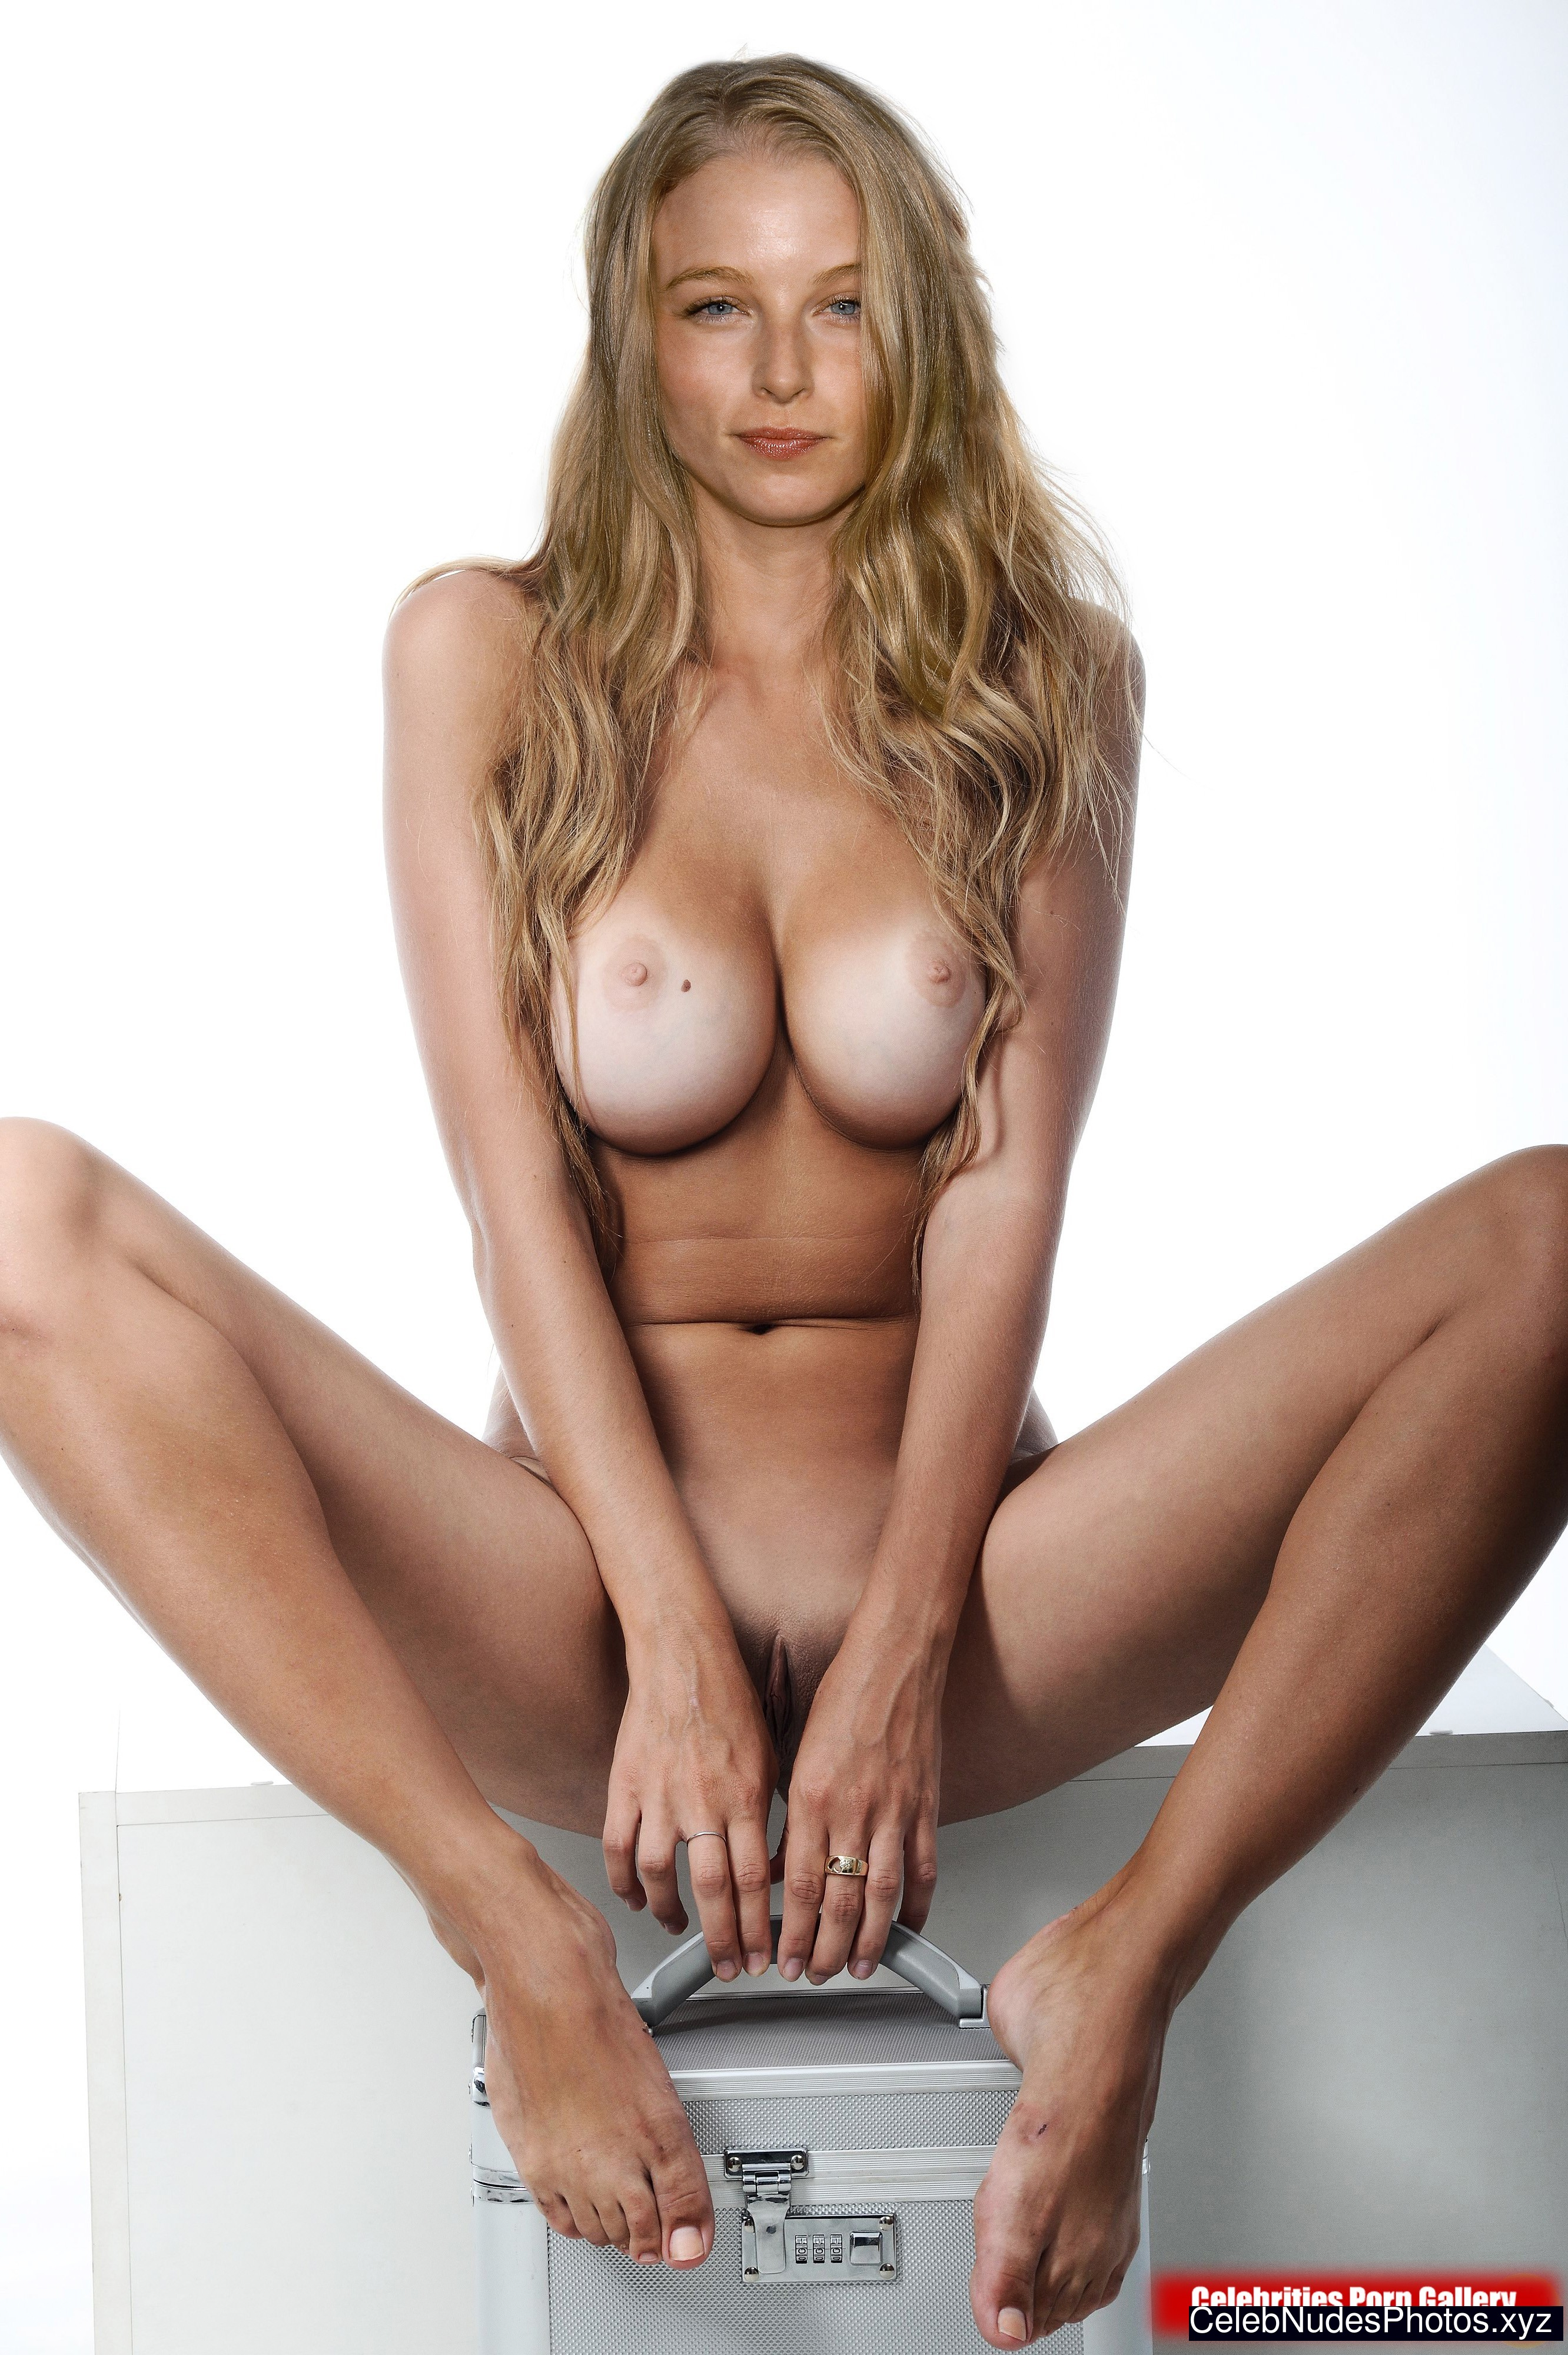 rachel nichols nude pics